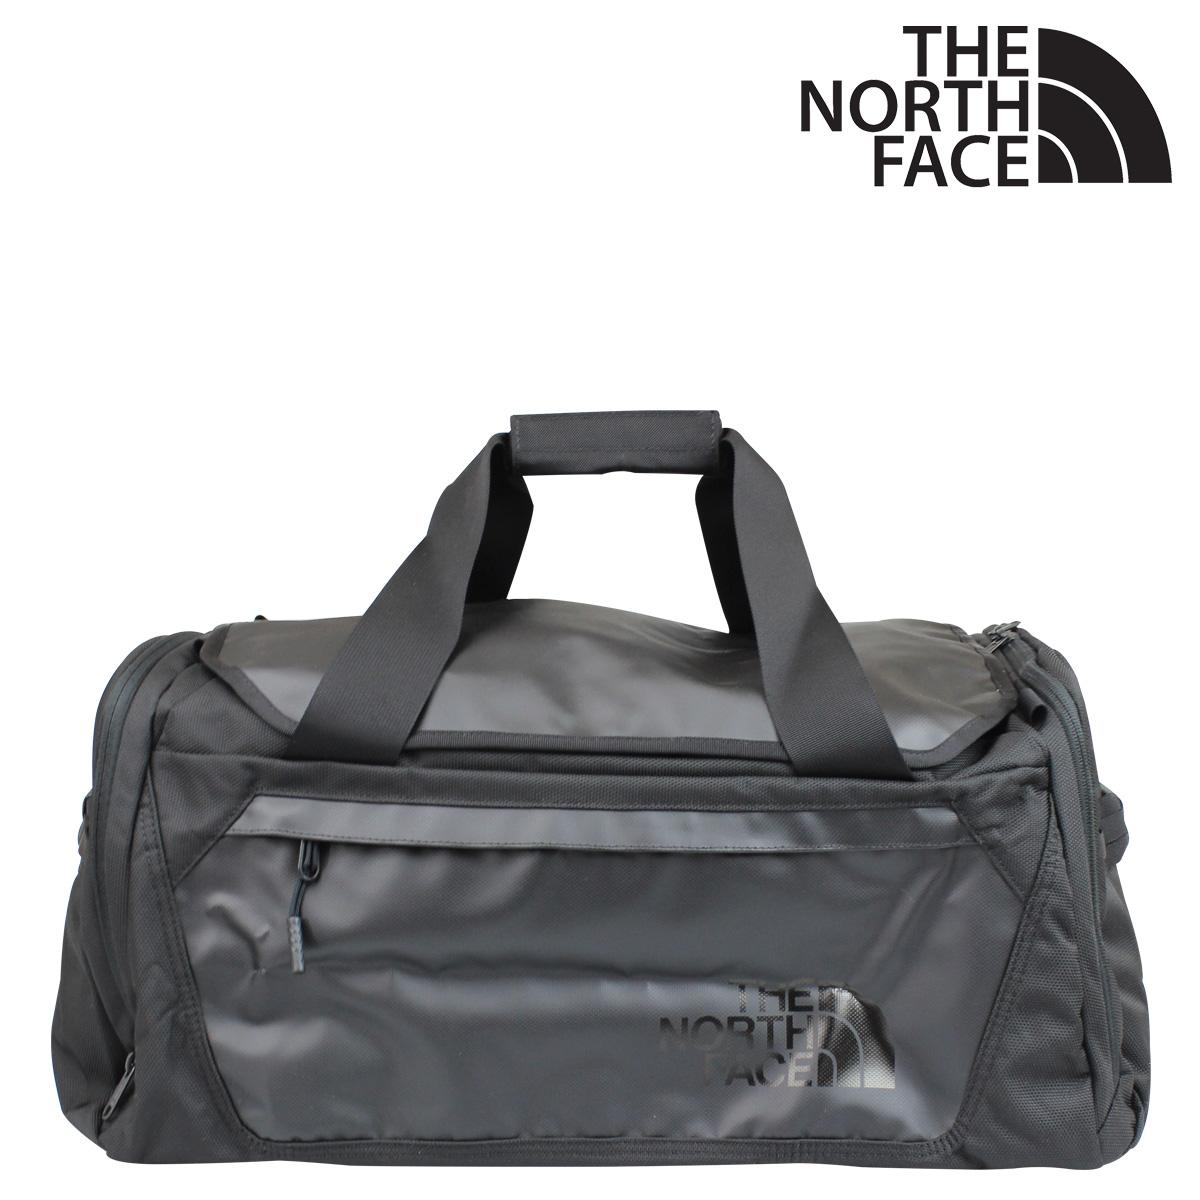 46c7cfd41 North Face THE NORTH FACE duffel bag Boston bag CF50 60L LANDFALL  EXPANDABLE DUFFEL men gap Dis